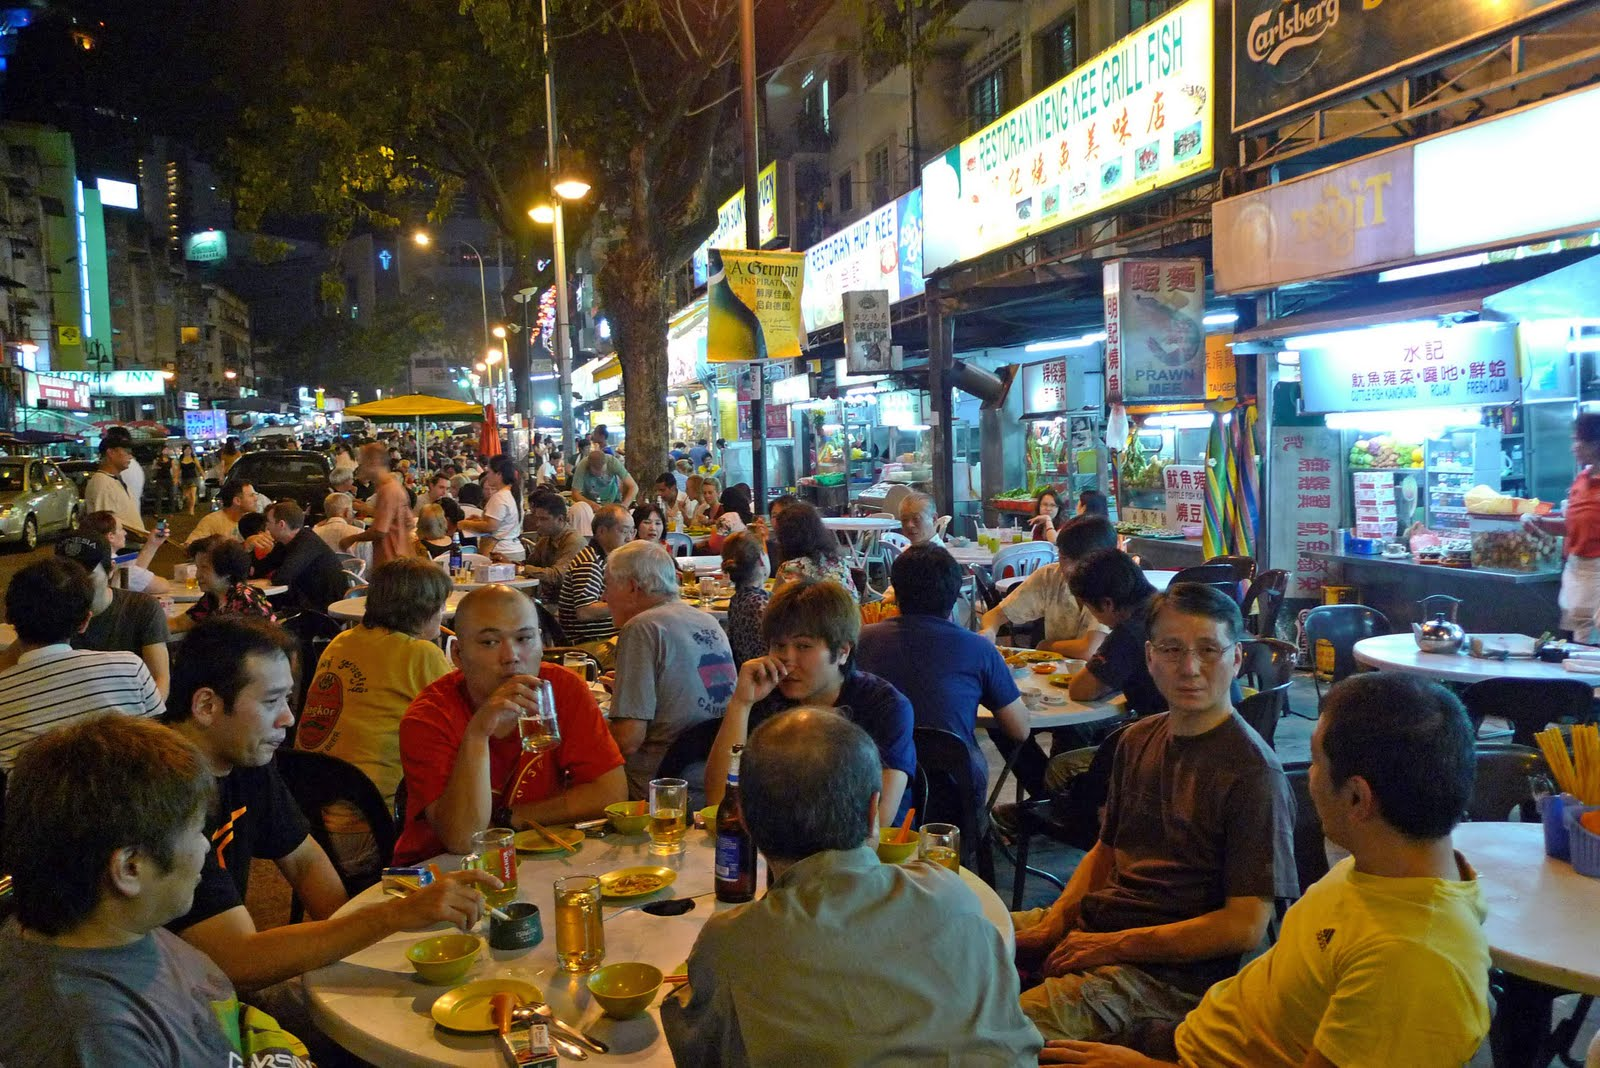 People at Jalan Alor market